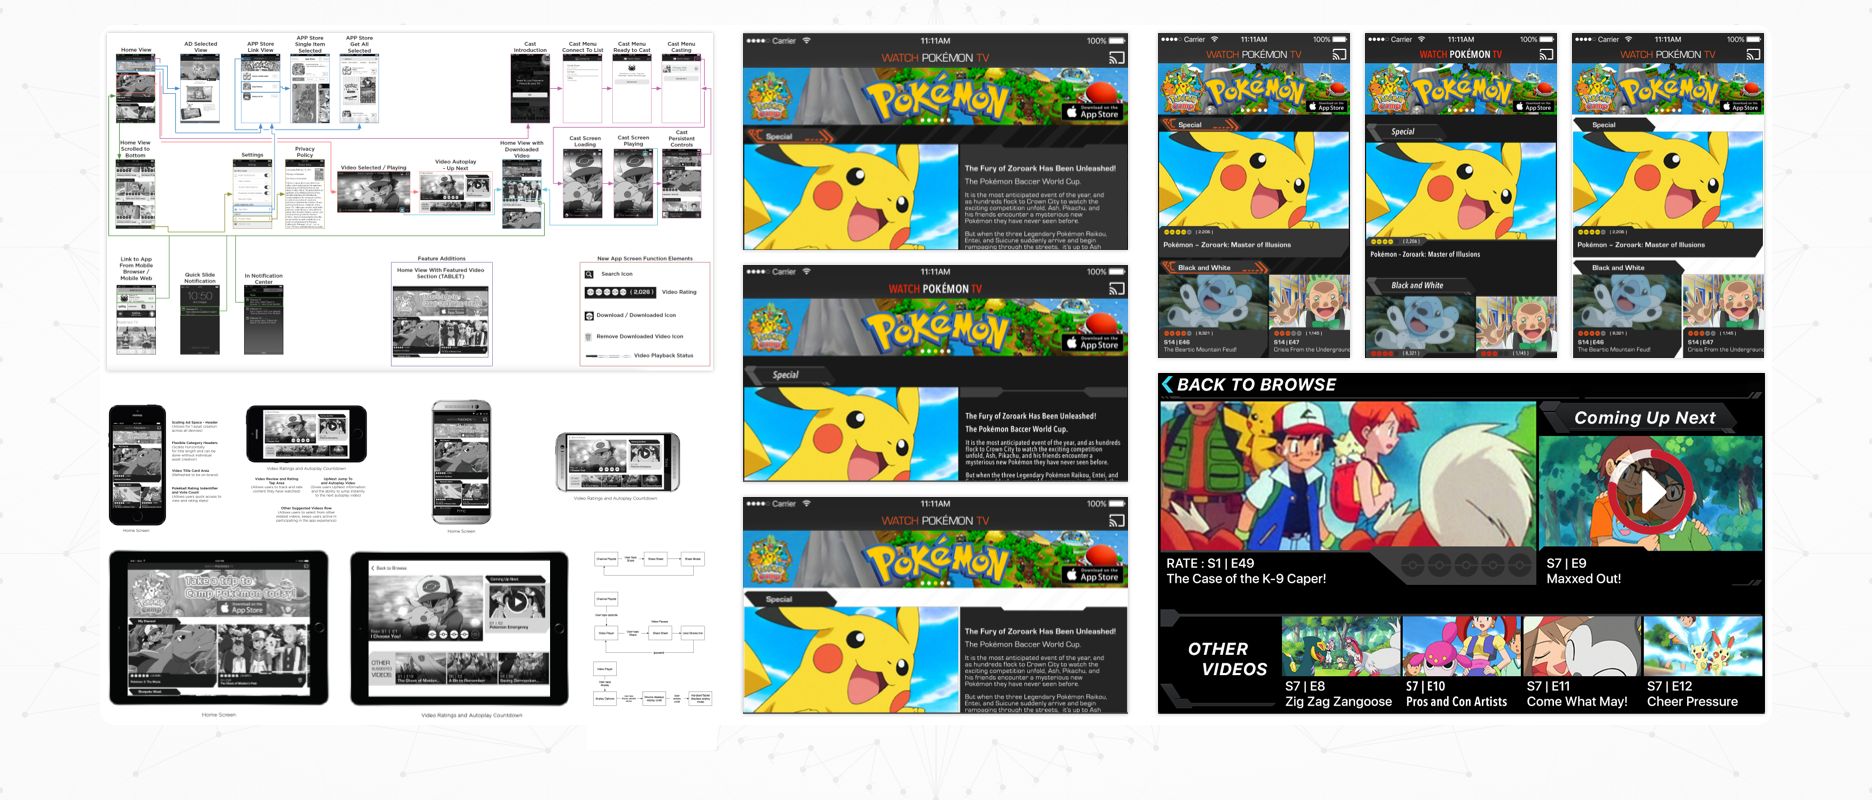 Pokémon TV - Case Study Image - Tablet and Handset Designs